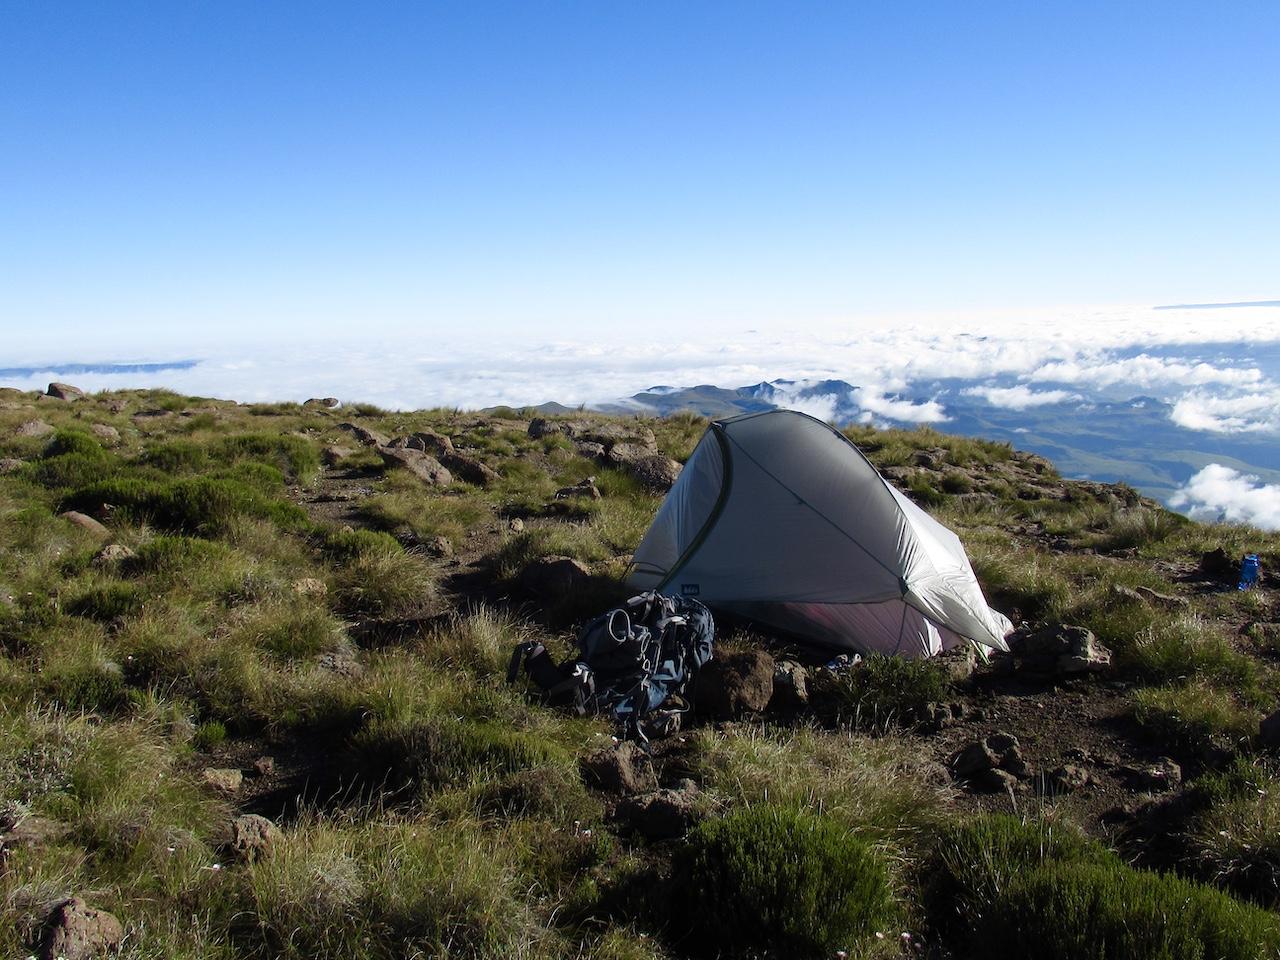 Lesotho Drakensberg Traverse Africa tent camping trekking